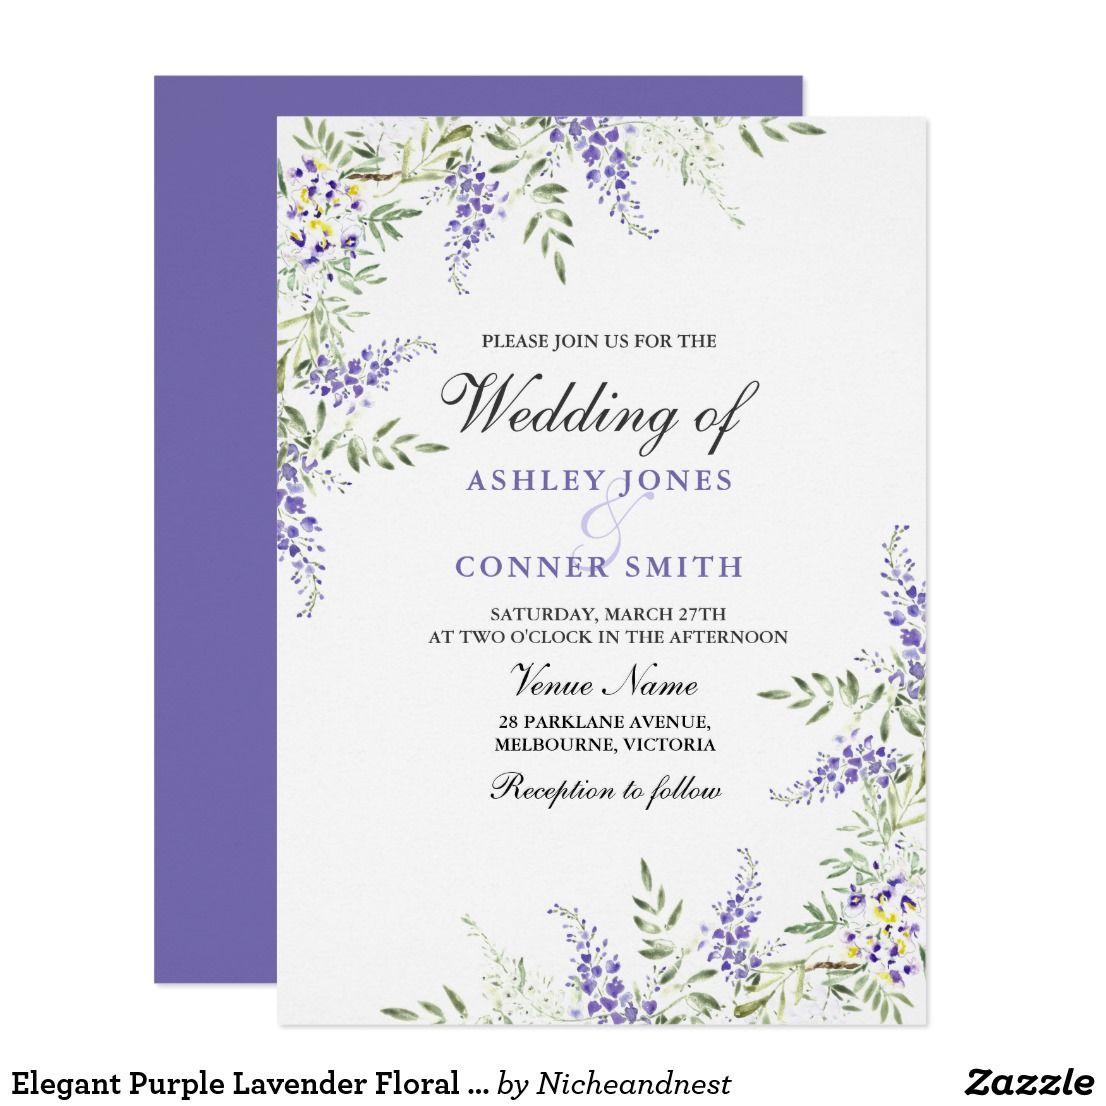 Elegant Purple Lavender Floral Wedding Invite | Wedding, Floral ...